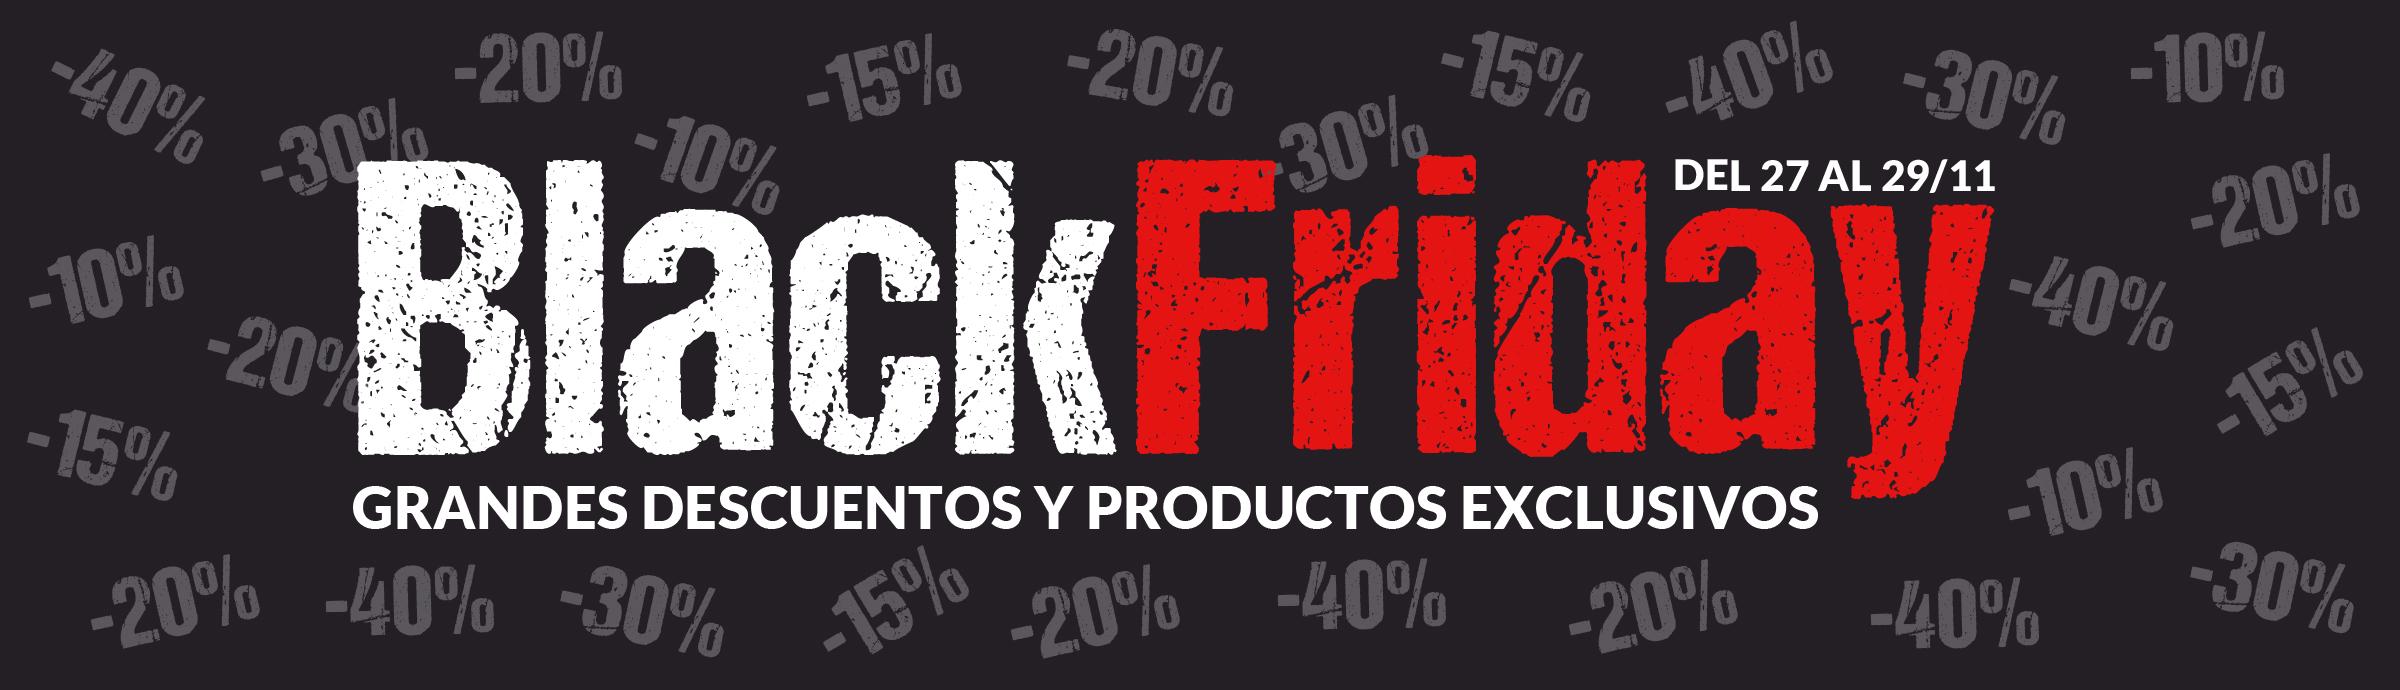 Black Friday Scalextric 2020